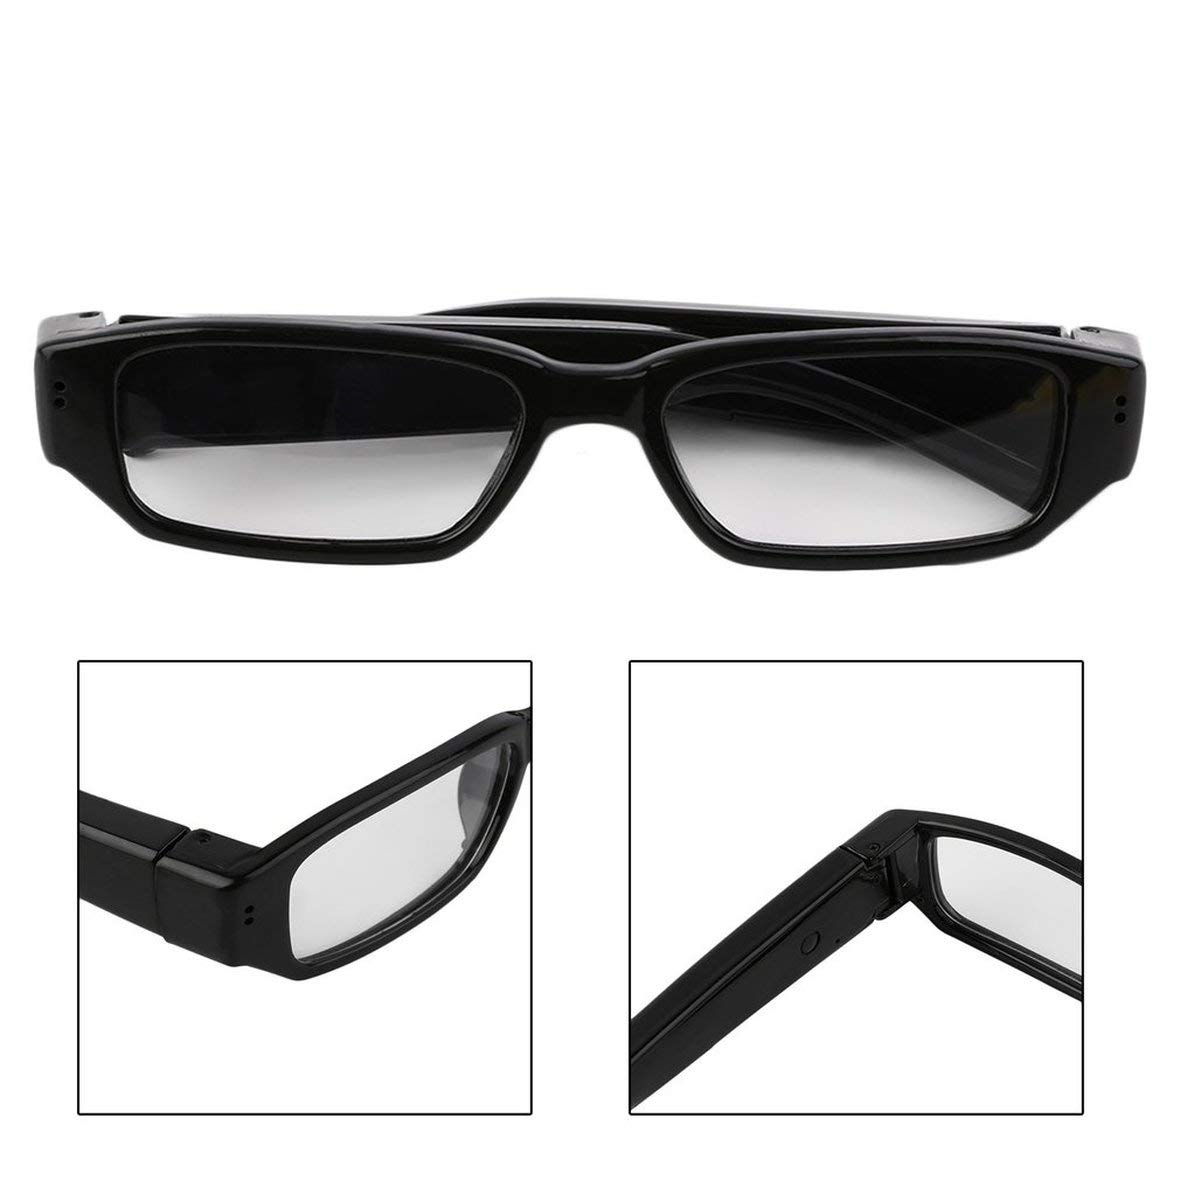 Heaviesk Mini 1080P HD C/ámara de Video Gafas Gafas Grabadora de Video DVR C/ámara de Video para Deportes al Aire Libre Senderismo C/ámara